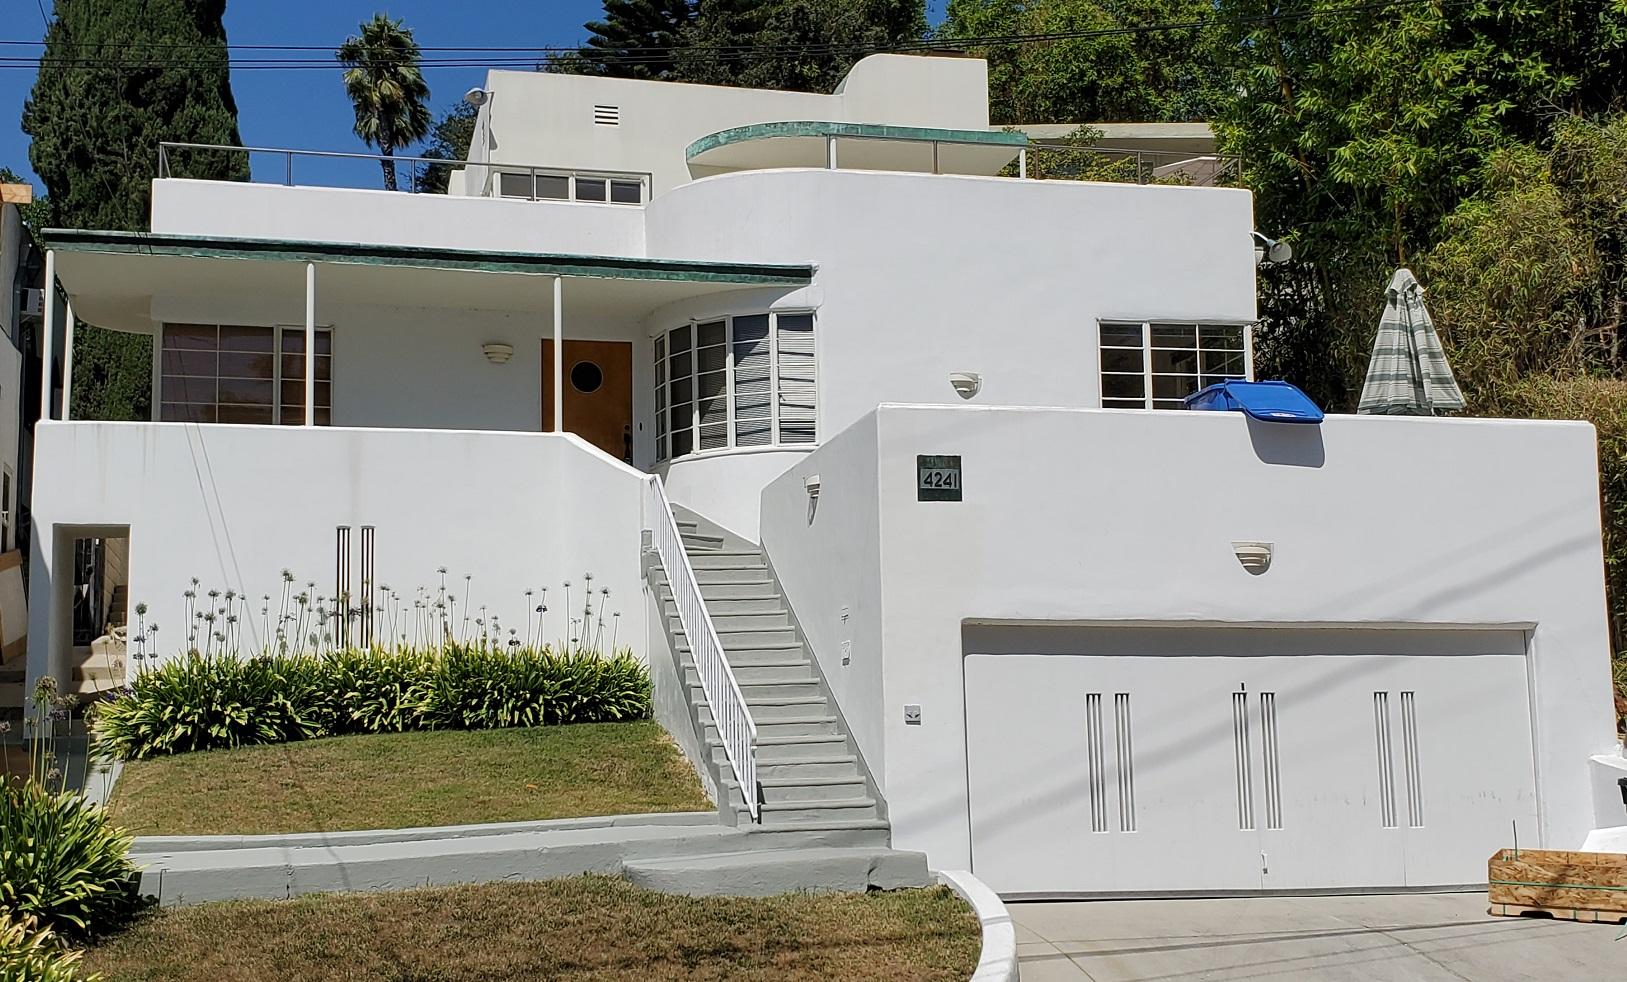 Victor M Carter Residence-Milton J Black - 4241 Newdale Dr in Los Feliz-20190921_131708